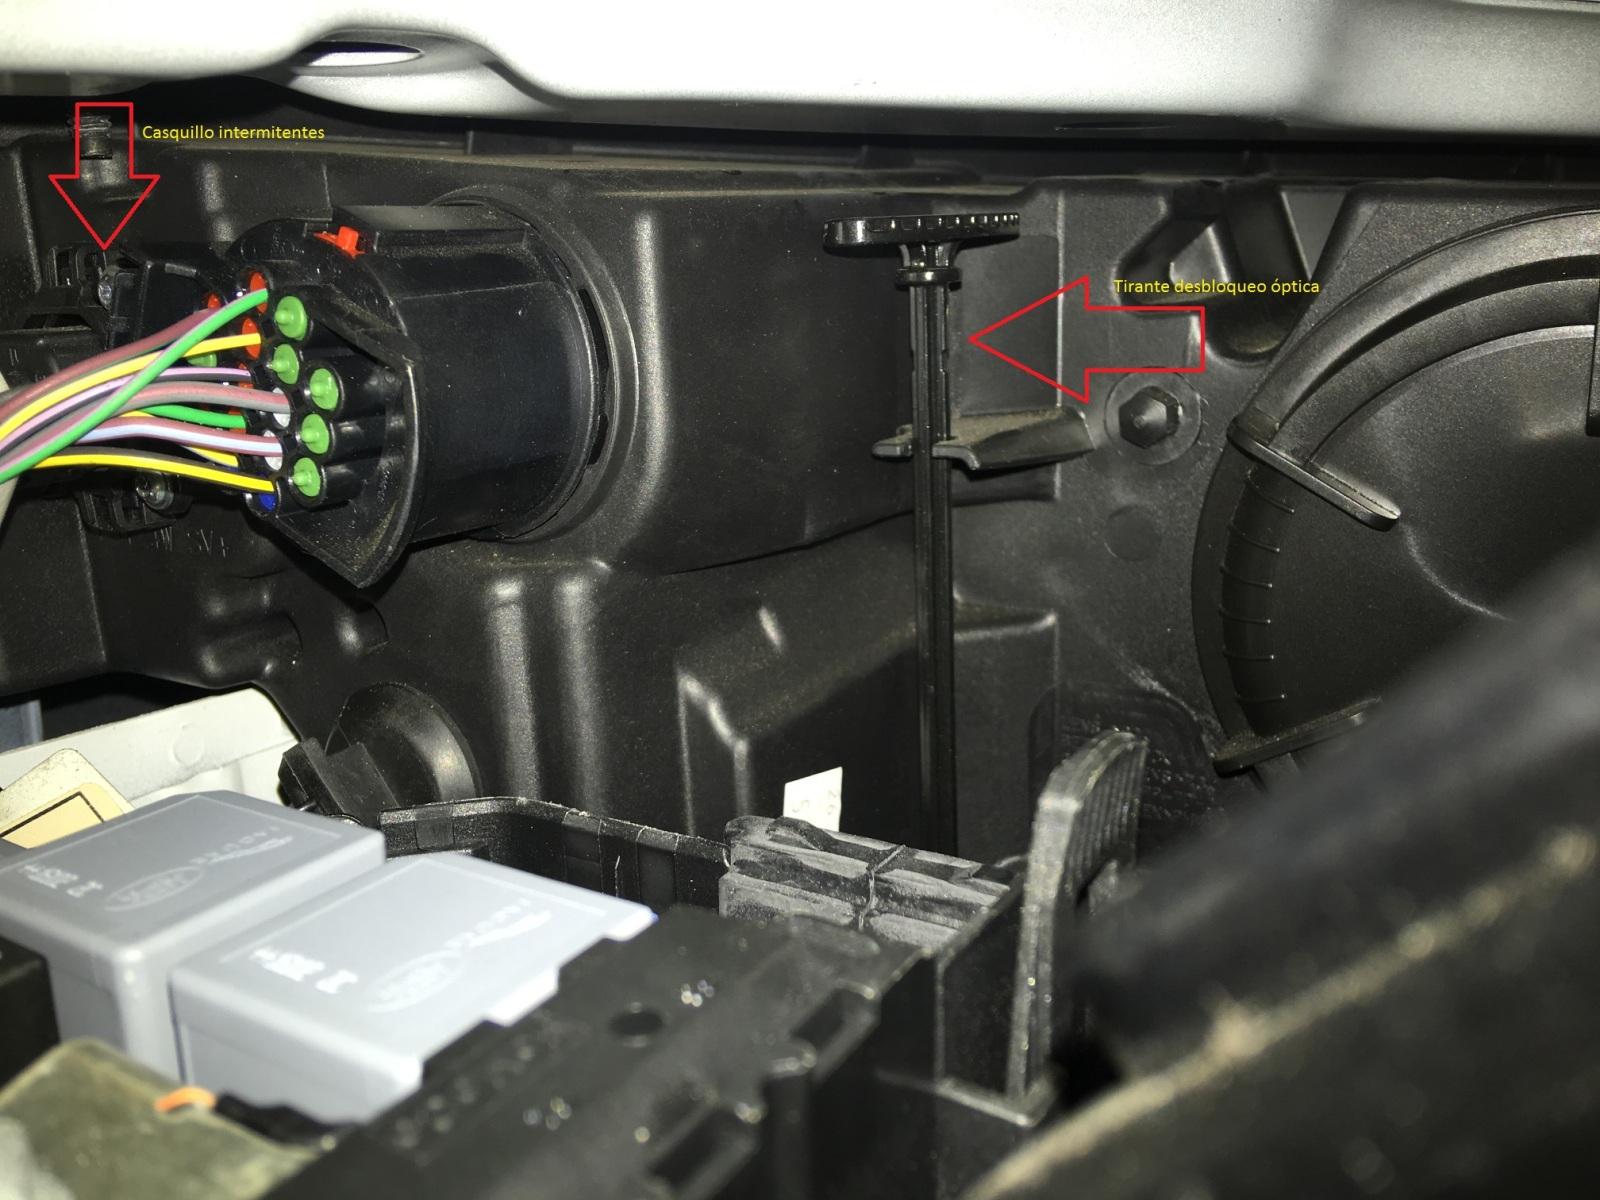 Desmontar ópticas delanteras para cambio pilotos intermitentes por LED 68xwmr